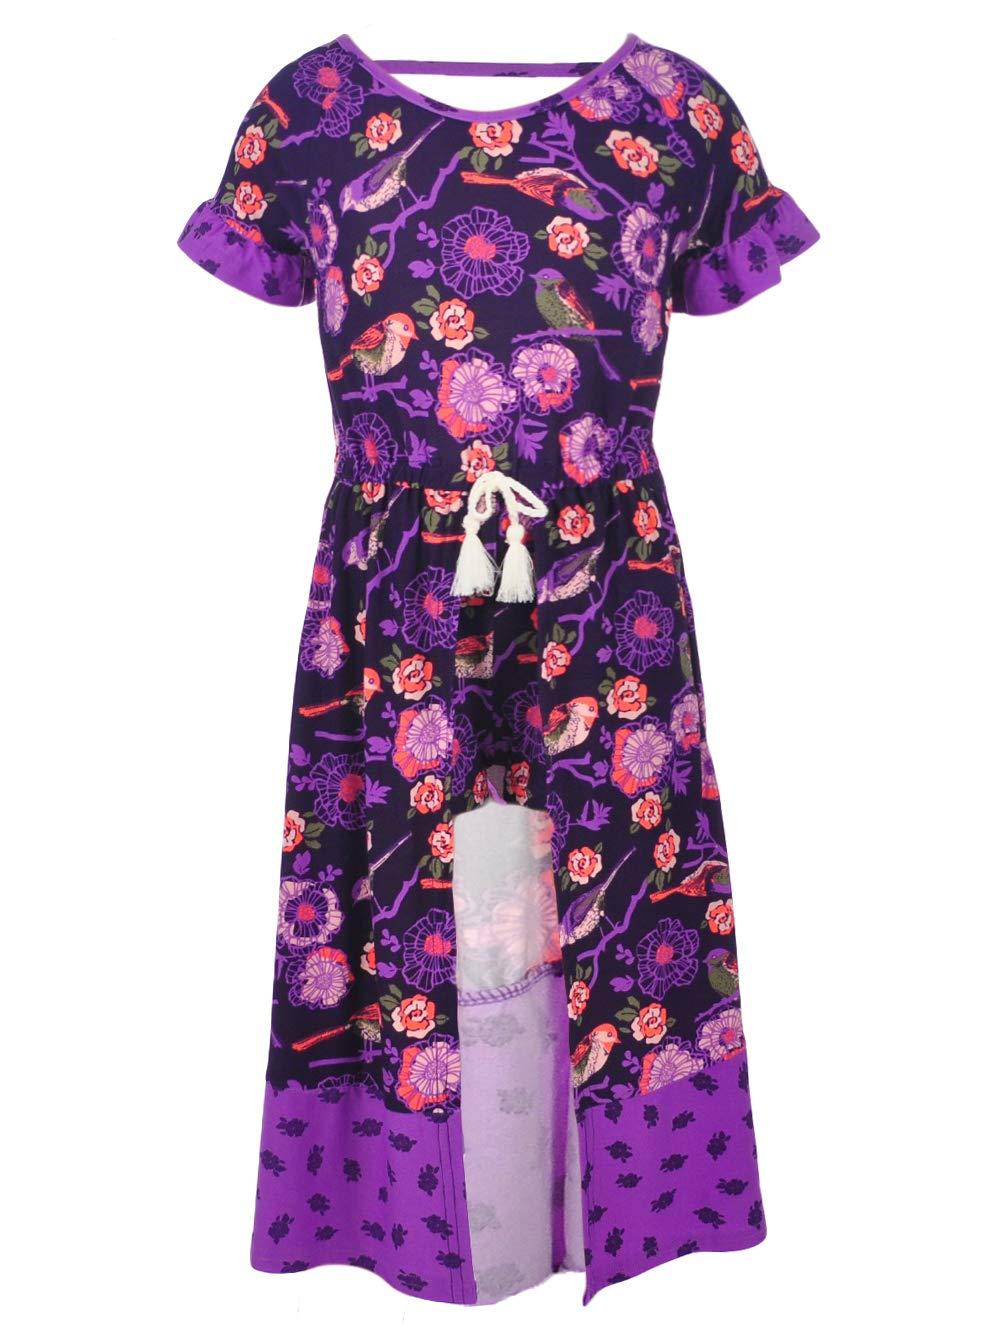 One Step Up Big Girls' Romper Maxi Dress, Plum Floral, 10/12